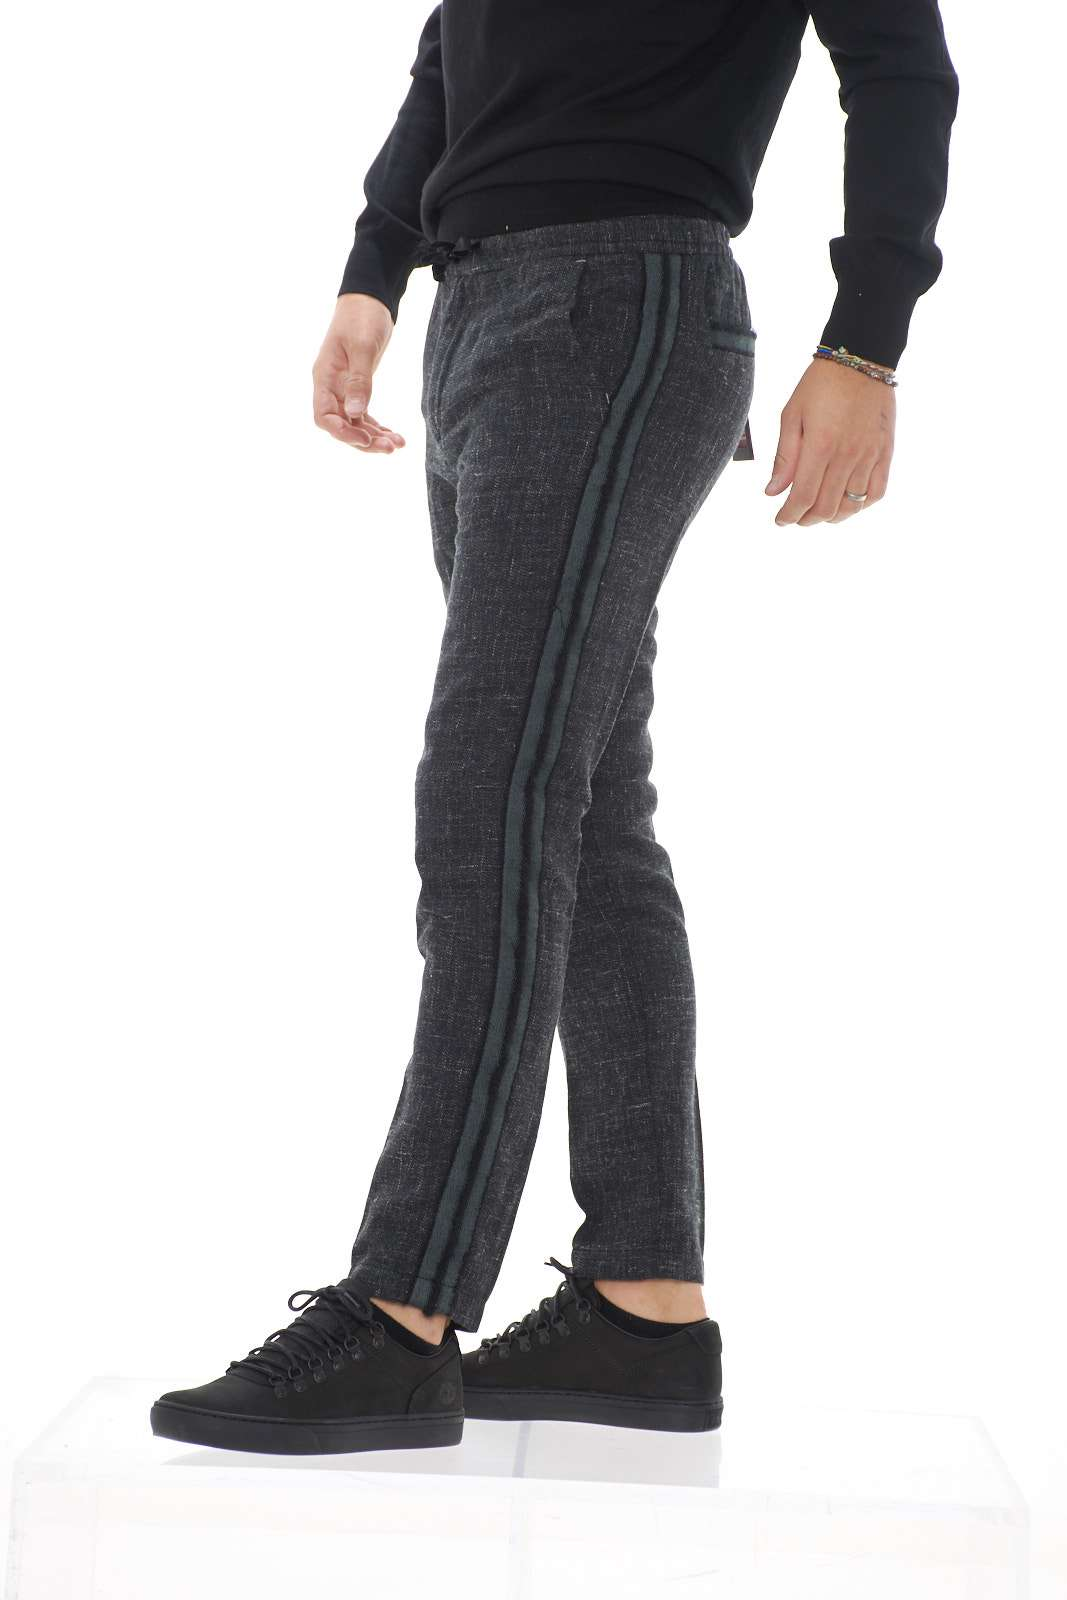 https://www.parmax.com/media/catalog/product/A/I/AI-outlet_parmax-pantaloni-uomo-Squad-psc9722-B.jpg